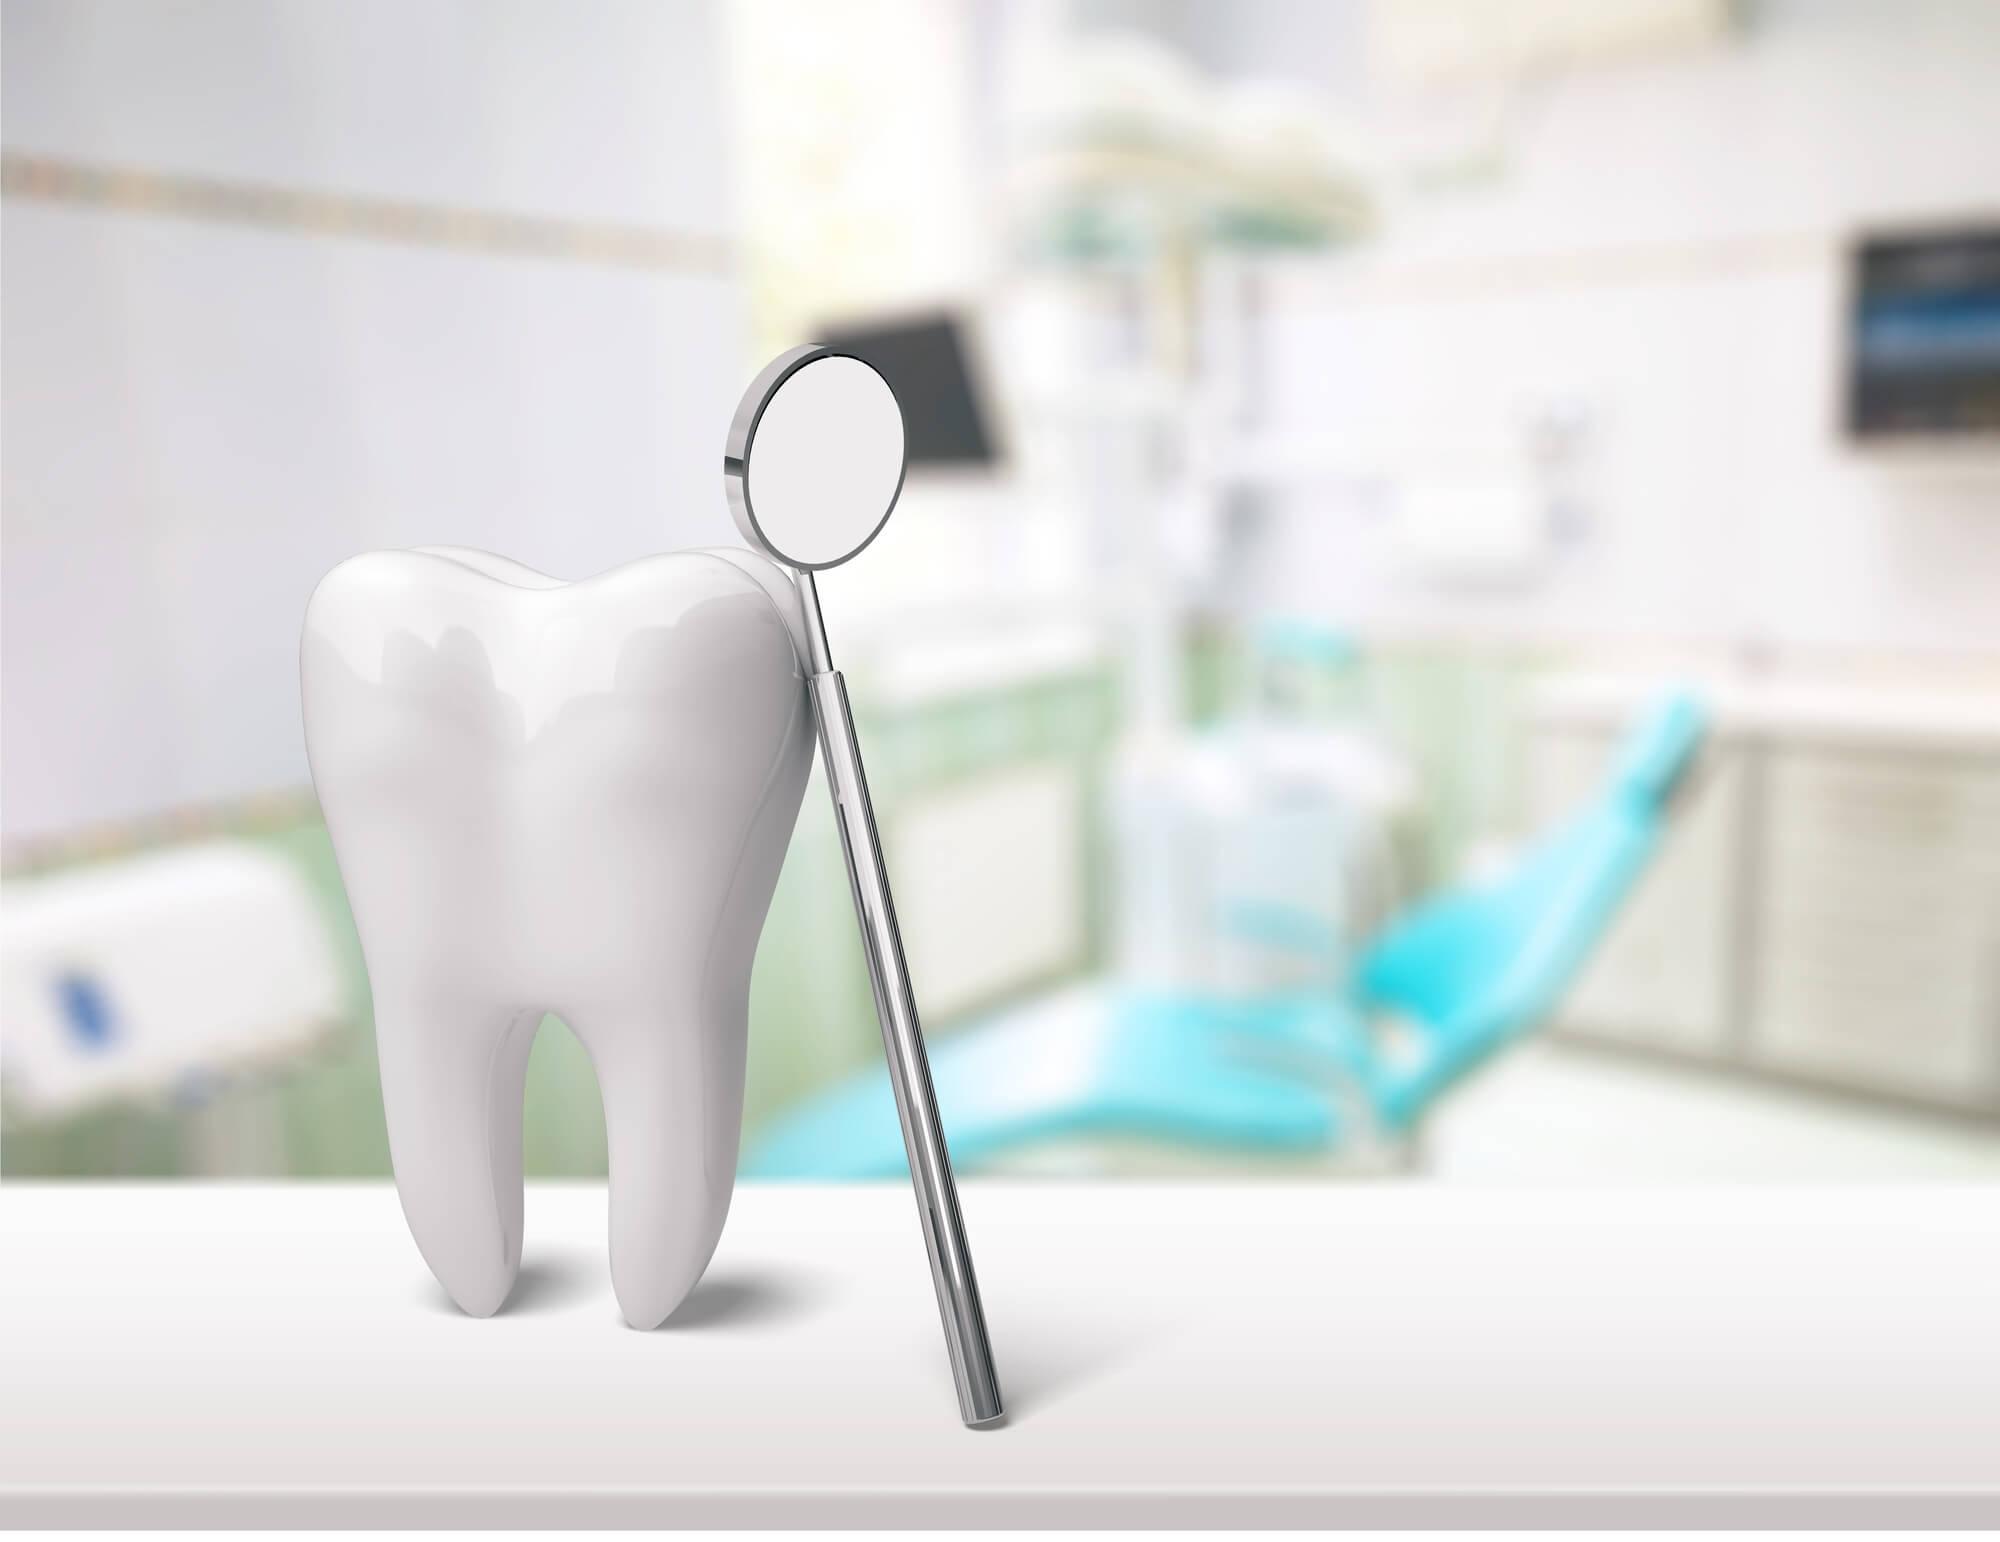 dentist office that provides Dental Implants Jupiter